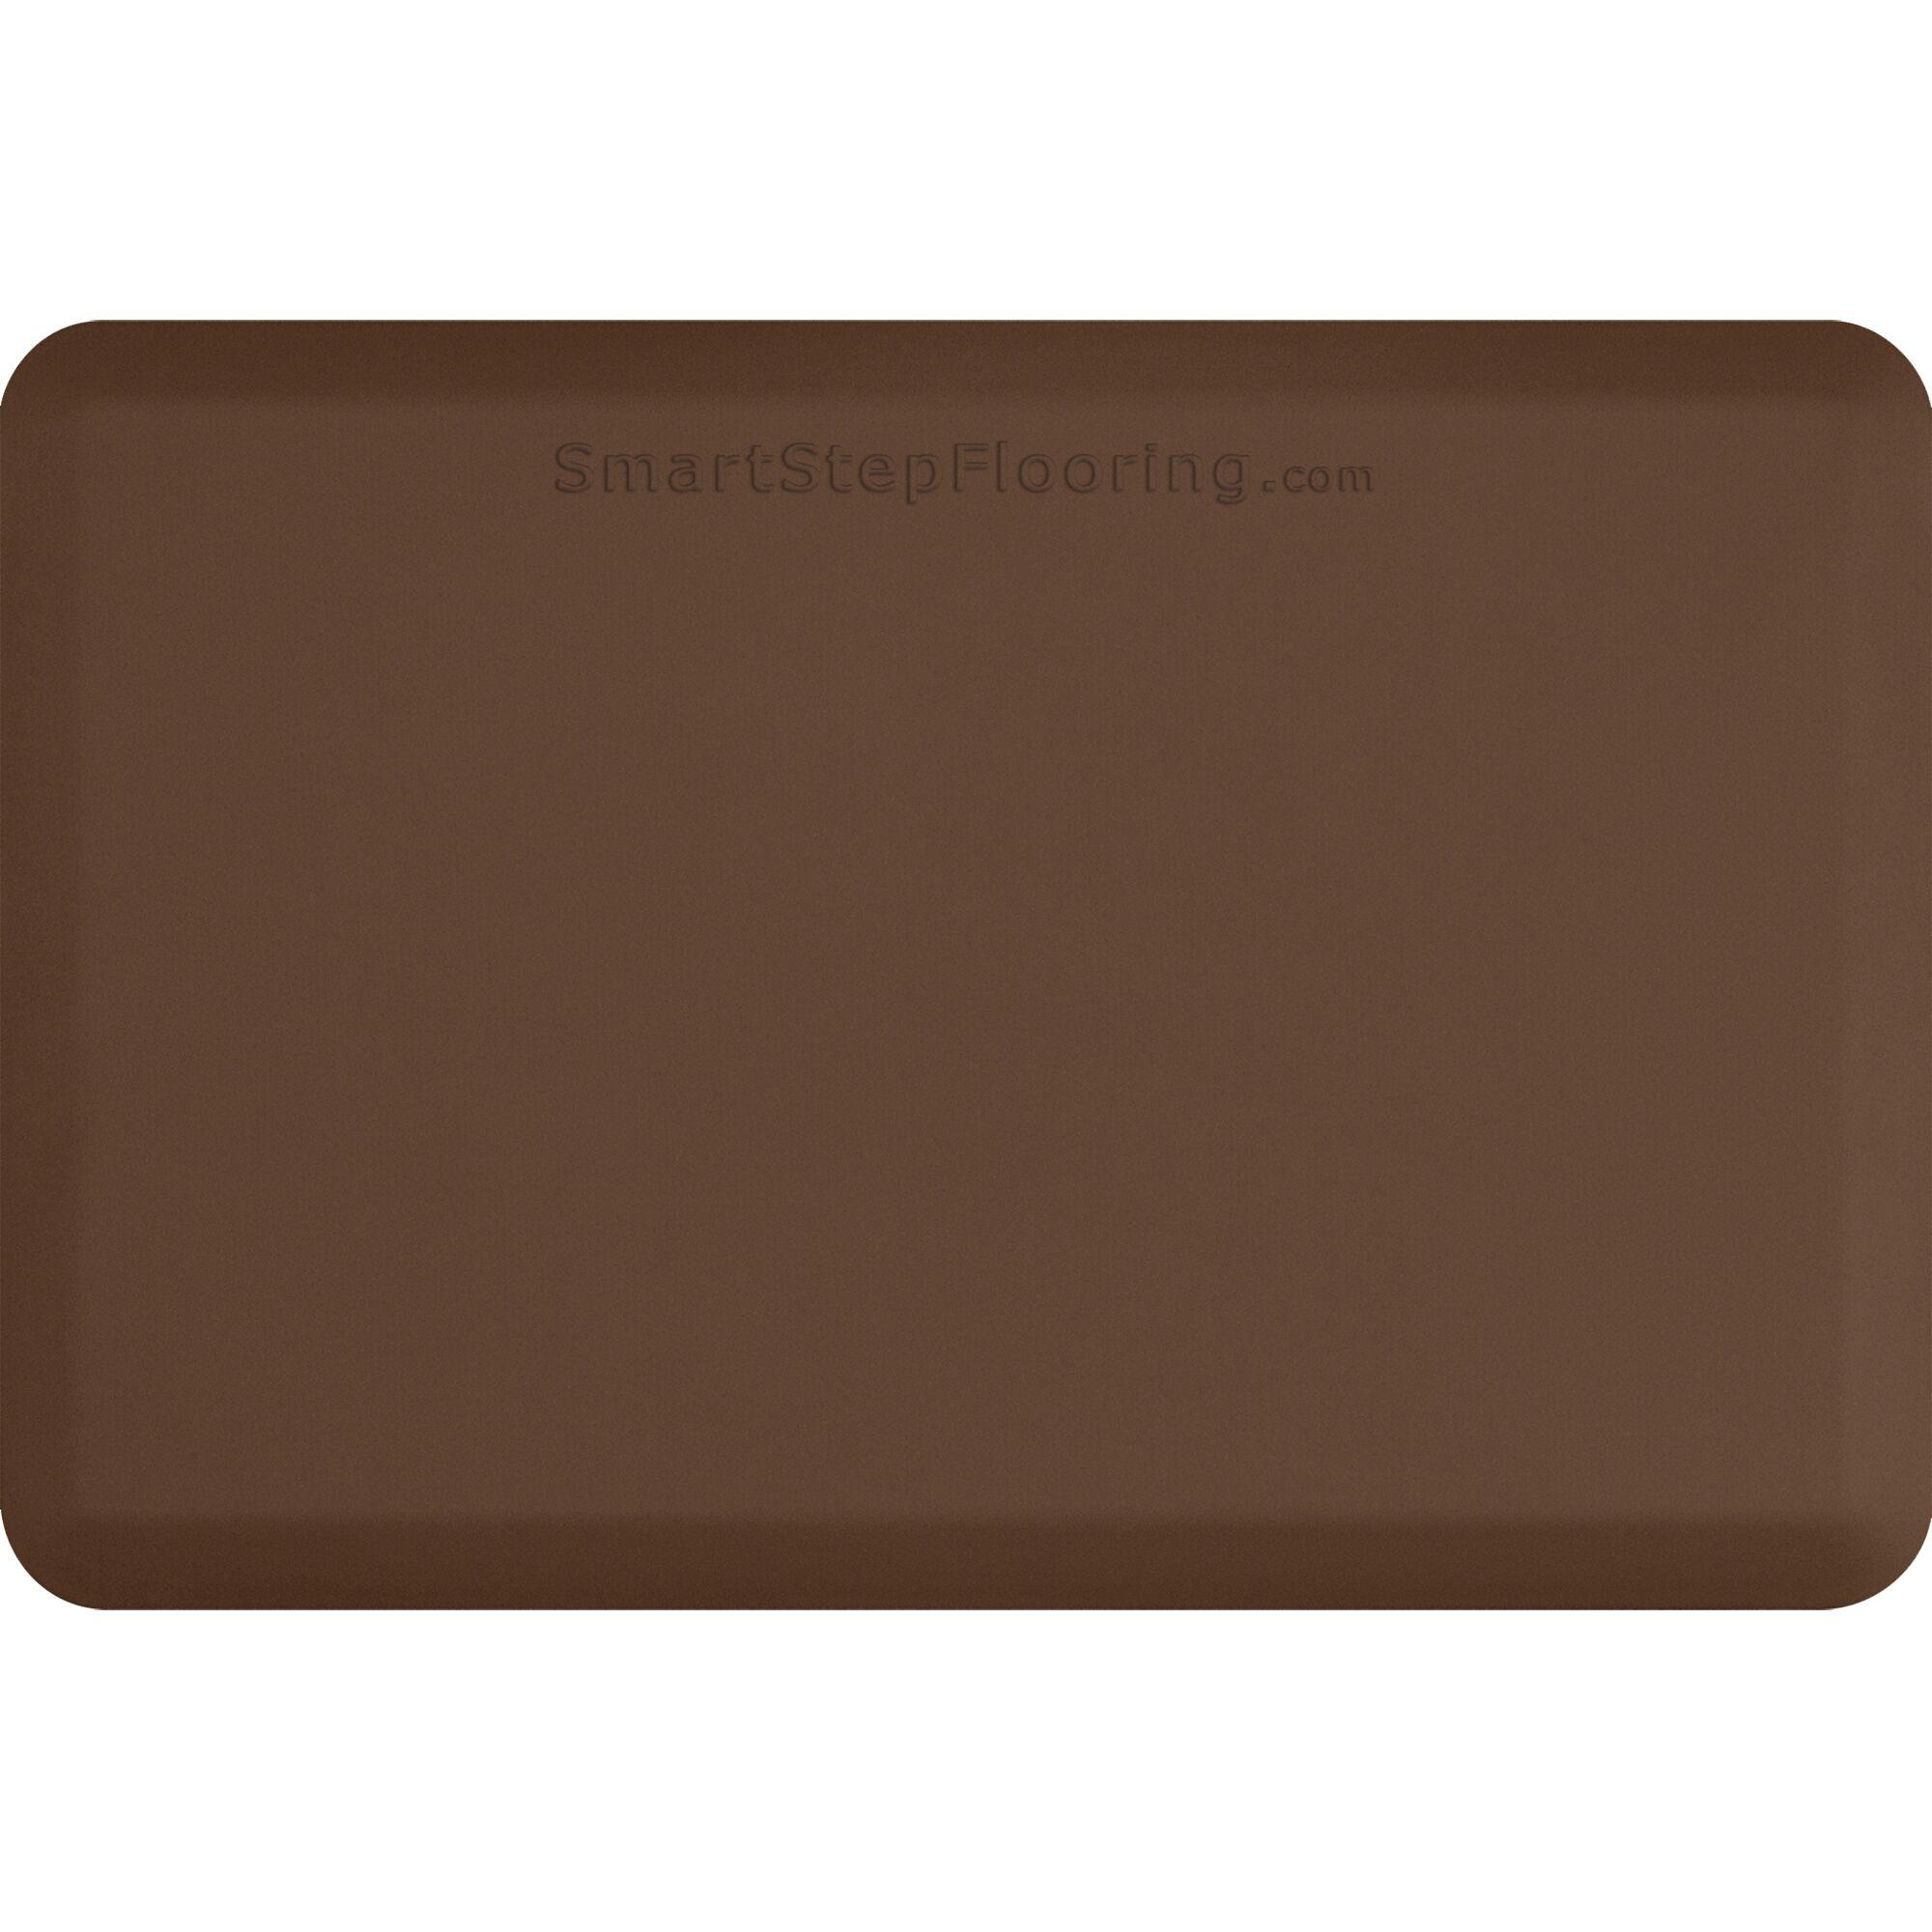 Kitchen Mat Mat Size: Rectangle 6' x 3', Color: Brown